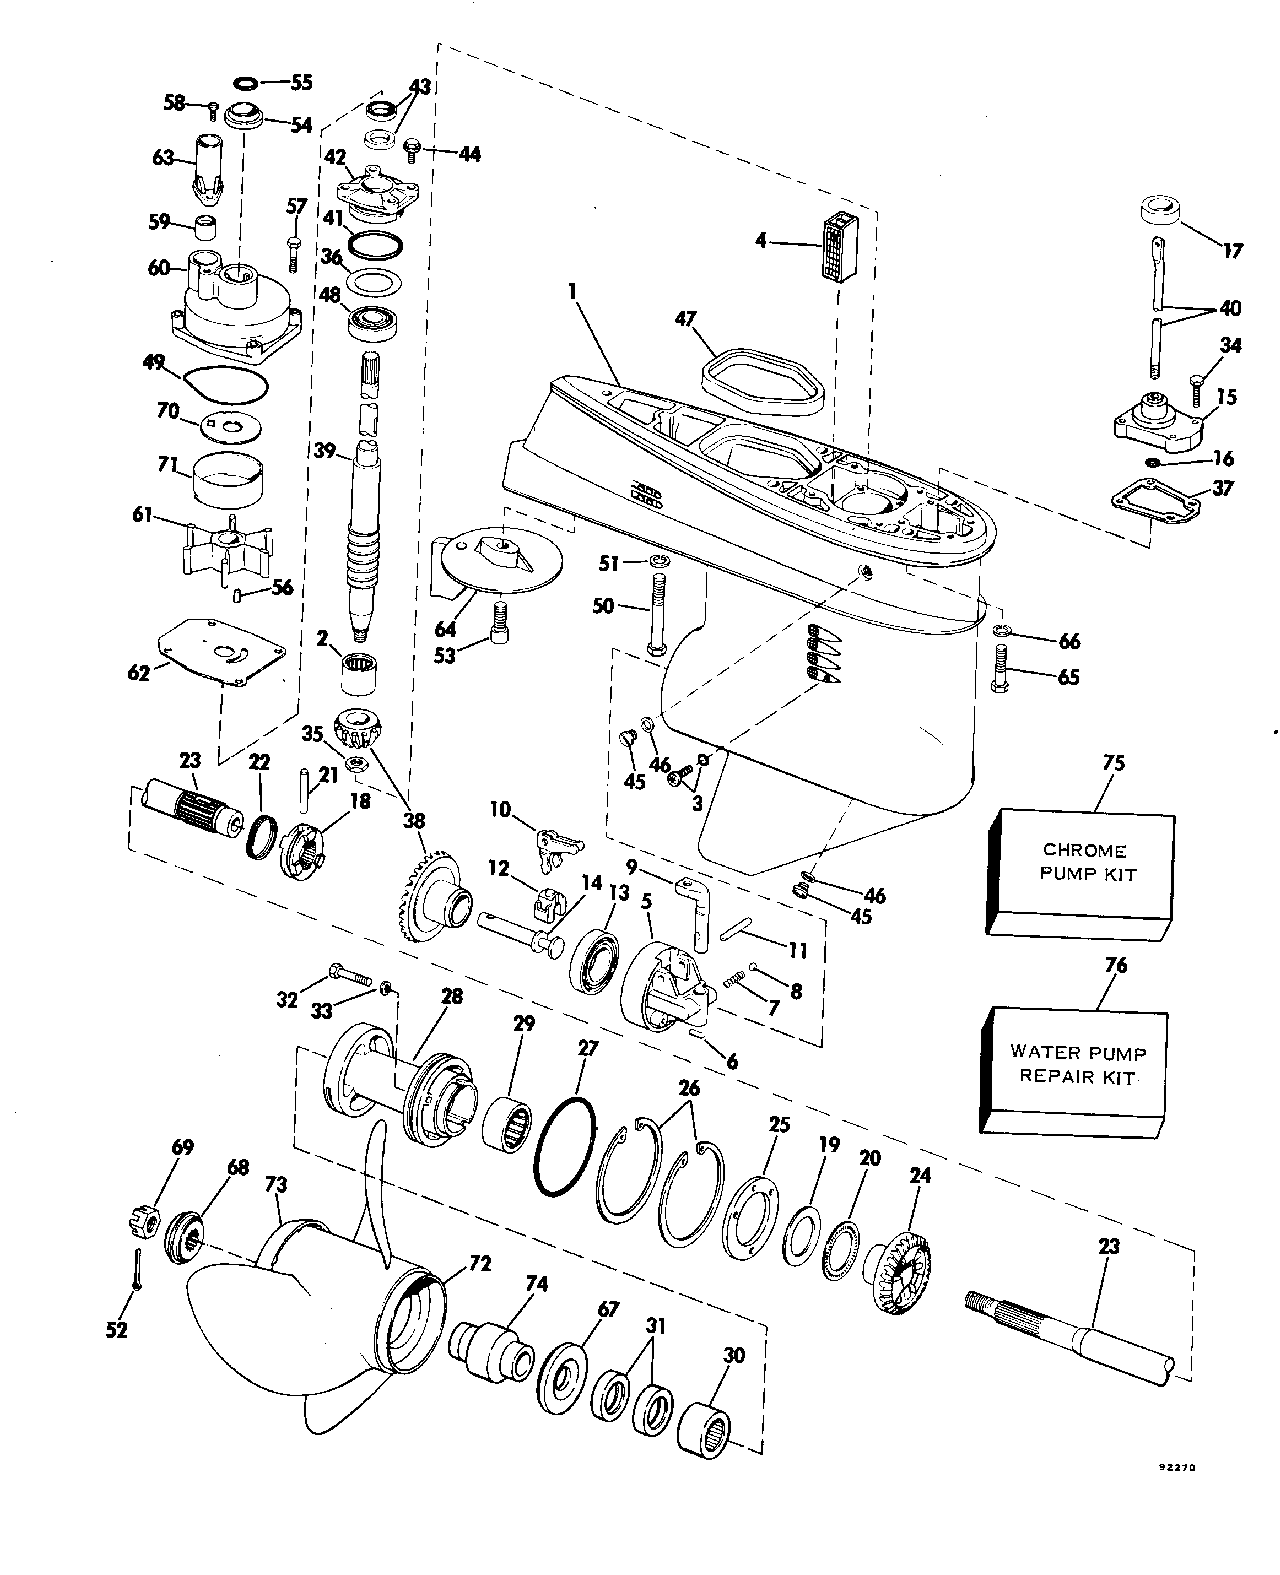 evinrude 70 wiring diagram database Champion Wiring Diagrams brp evinrude en 1980 70 e70elcsa 1980 gearcase 15 1988 70 hp evinrude evinrude 70 source 1988 evinrude wiring diagram